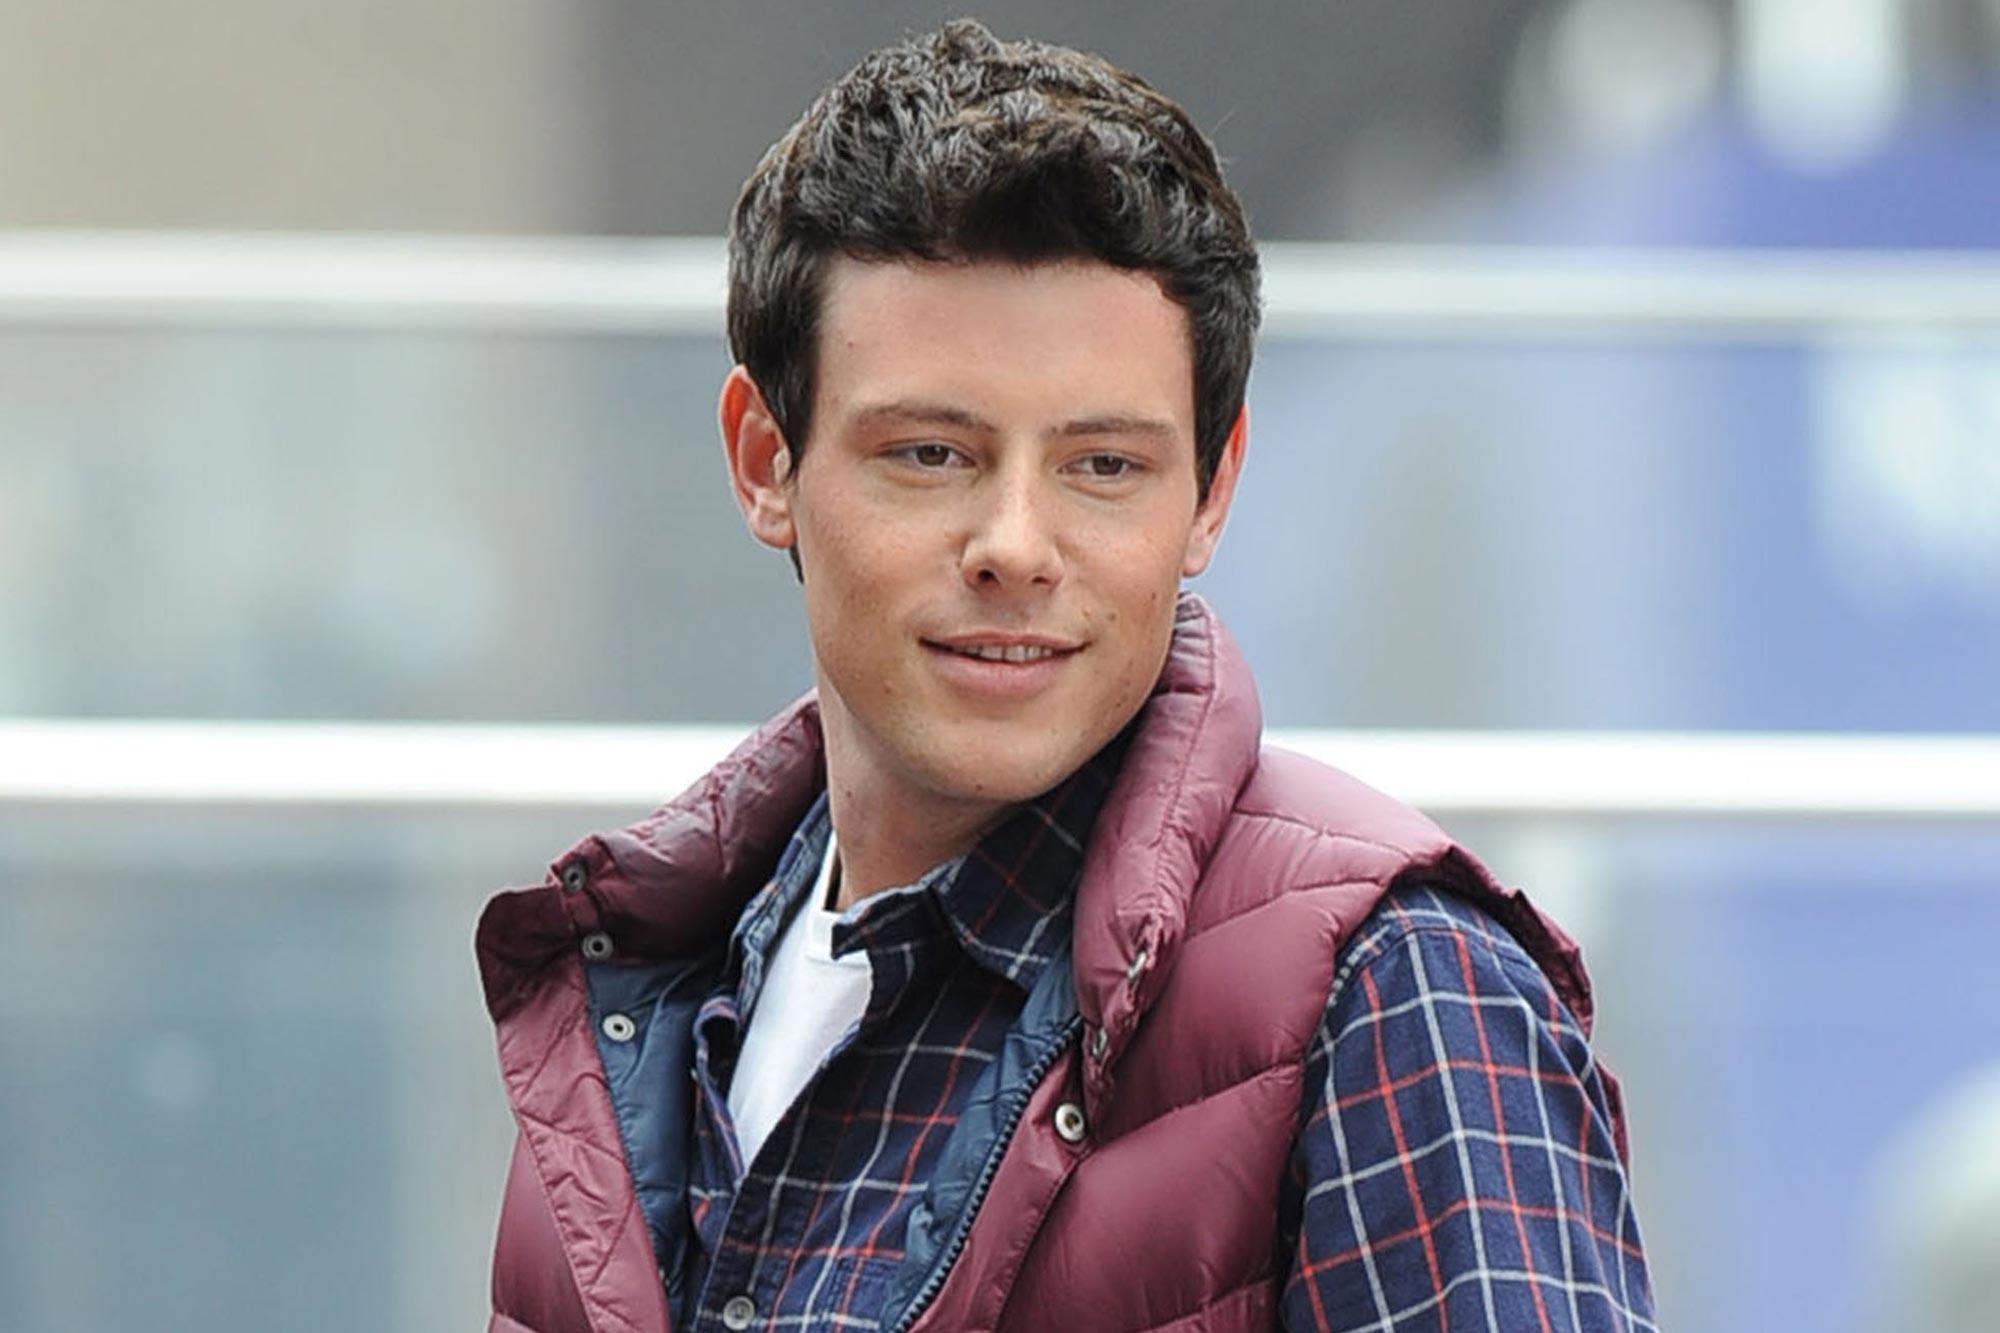 Finn (Cory Monteith), Glee